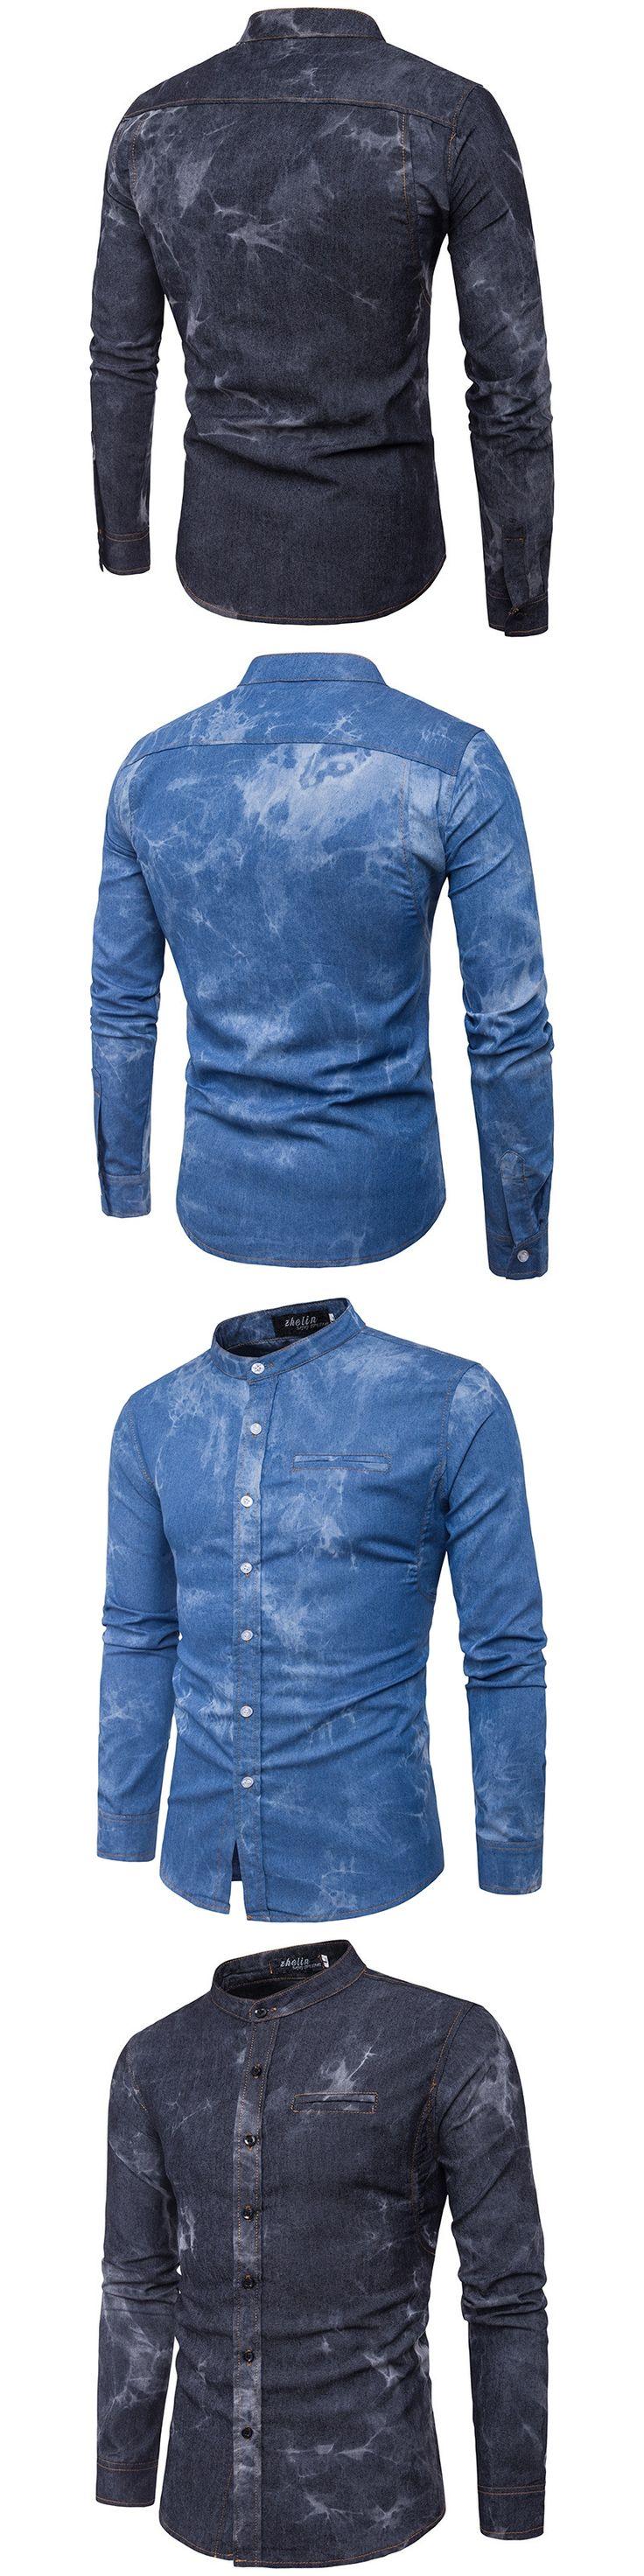 2017 Autumn British style Fake pocket denim shirts men black casual slim Stand up Collar denim shirts for men,size M-XXL NZ03